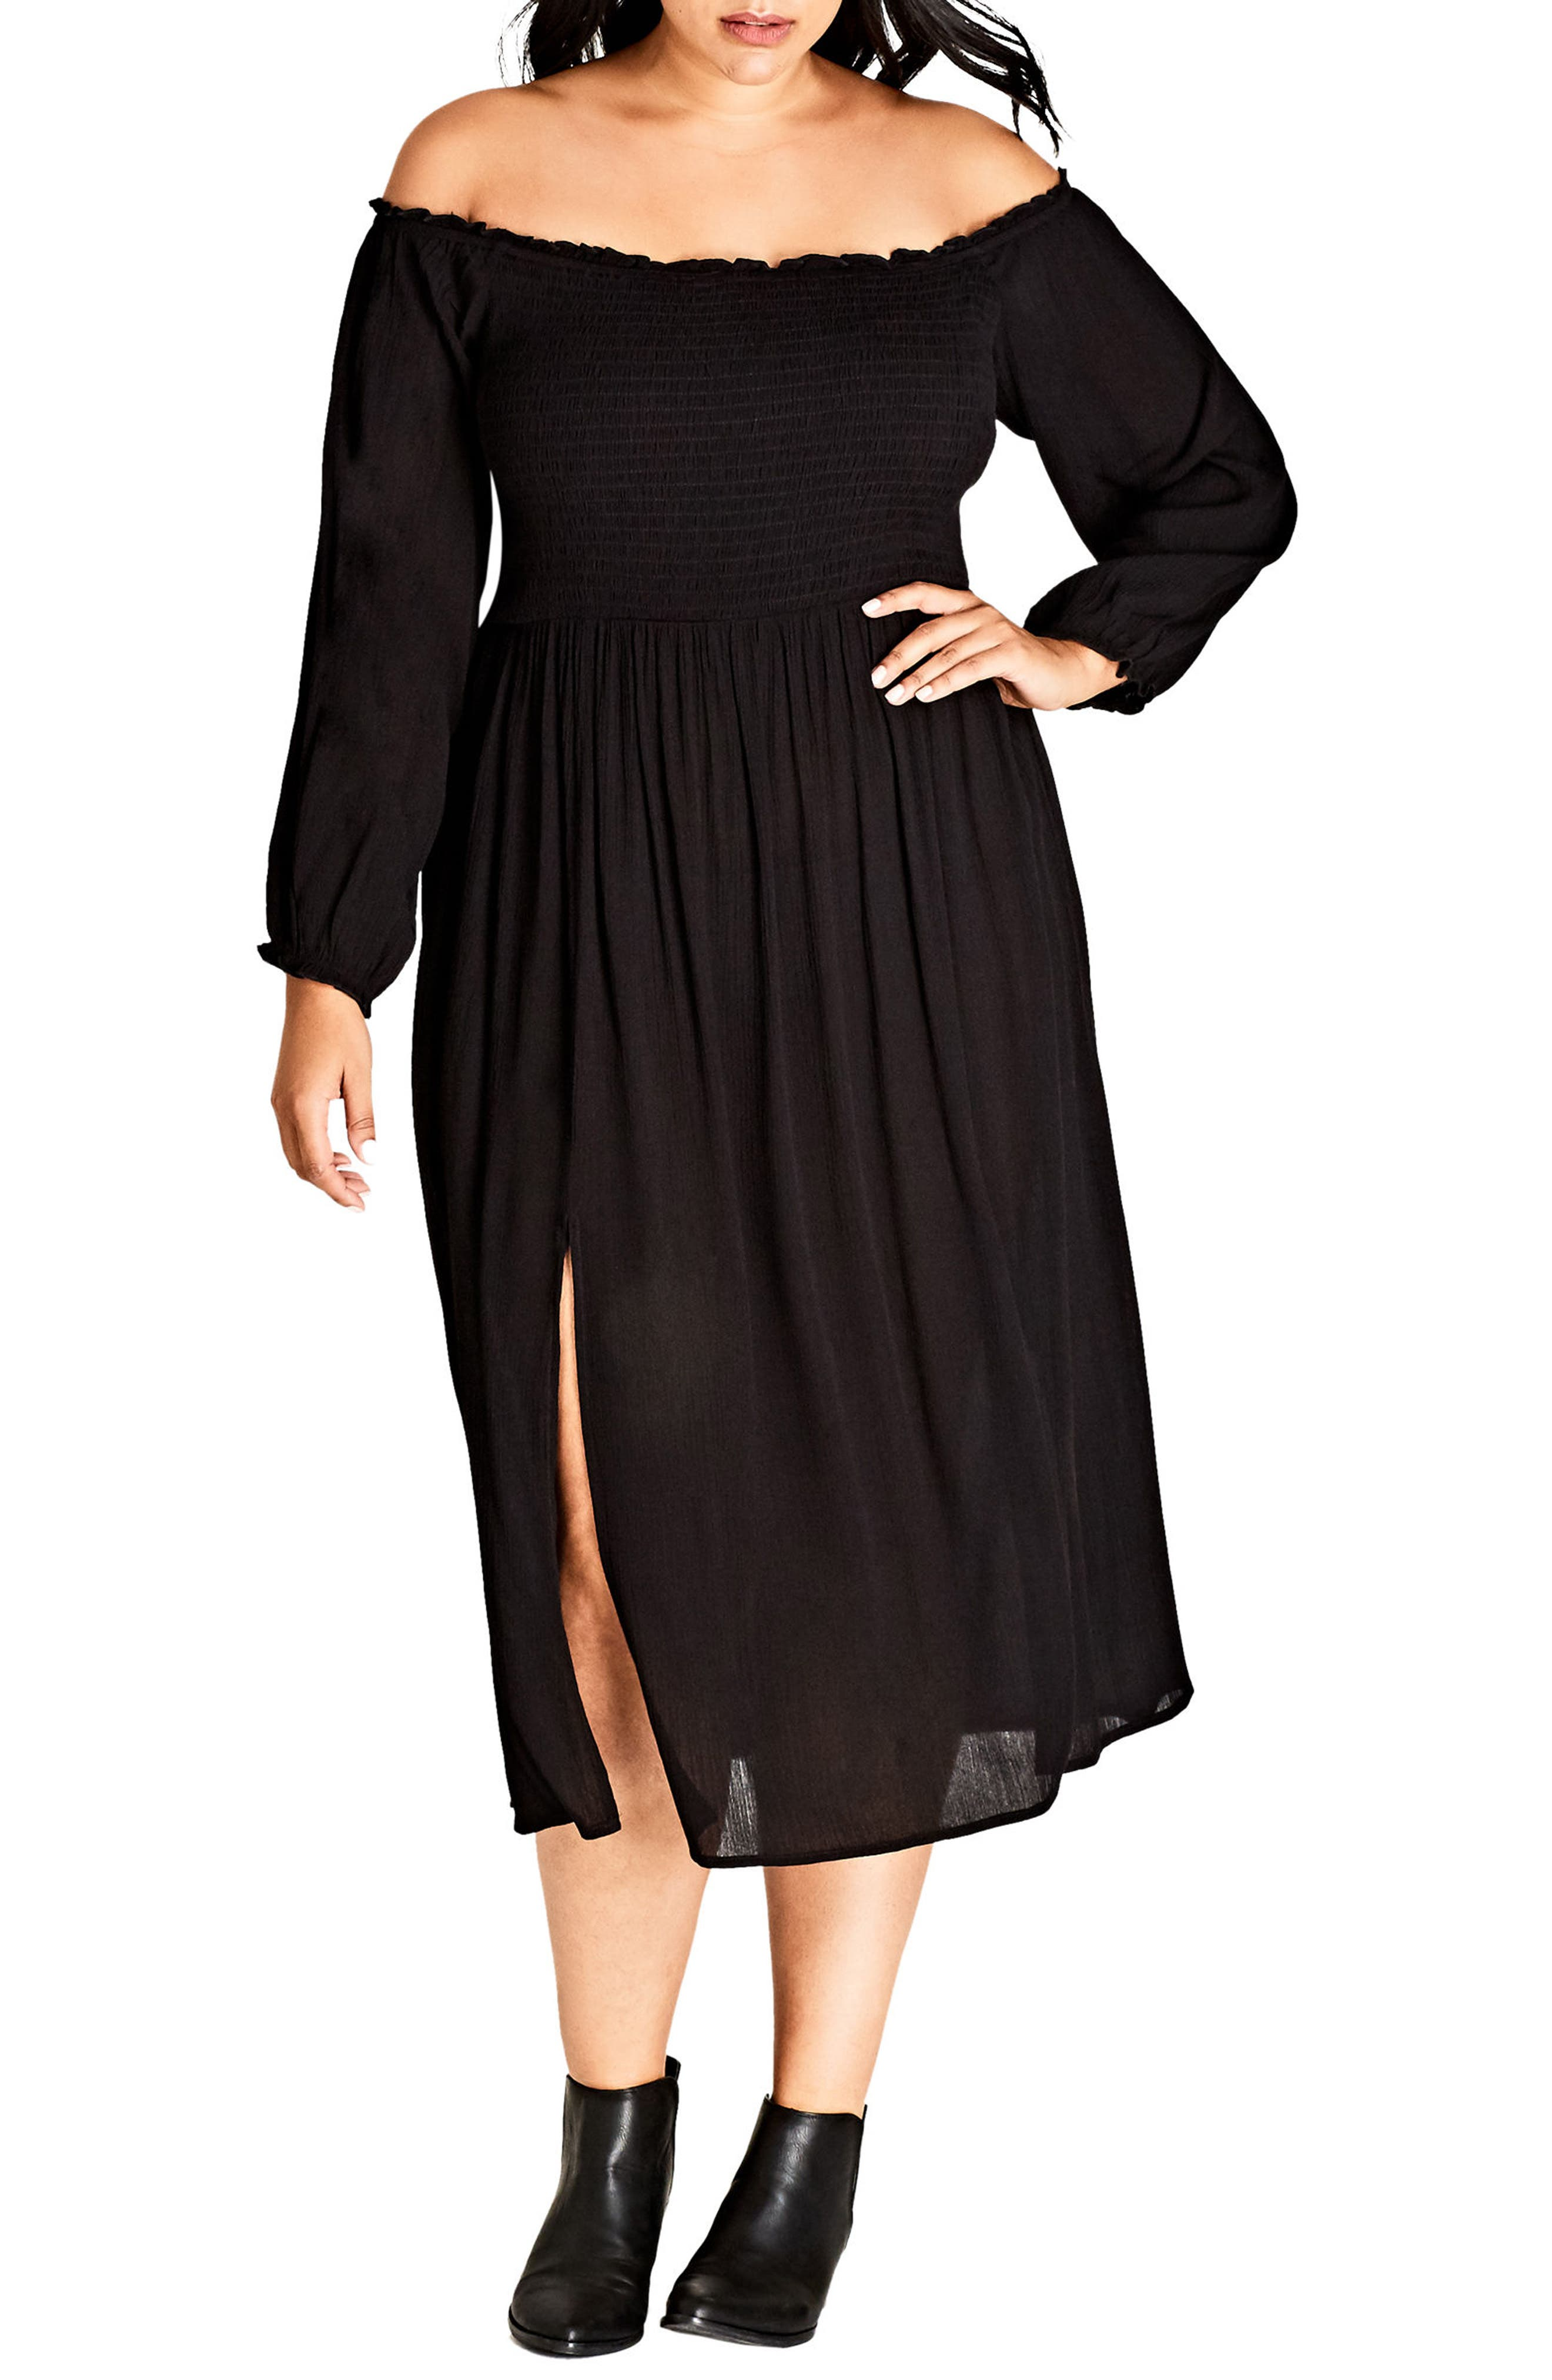 CITY CHIC Vintage Midi Dress